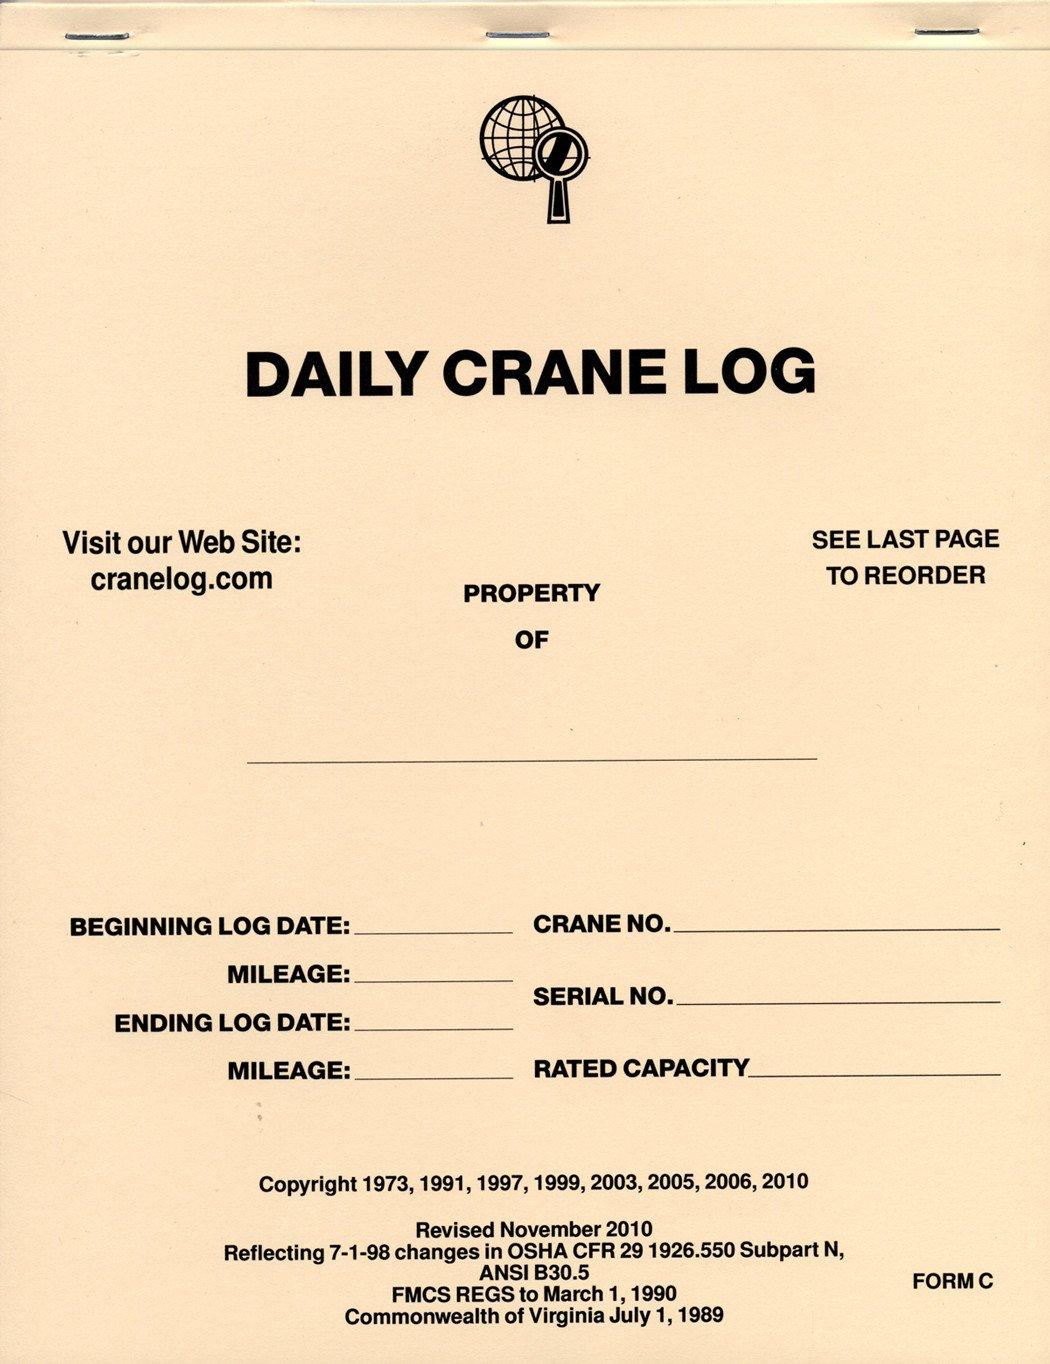 Crane Maintenance Log Book | Products | Books, Training